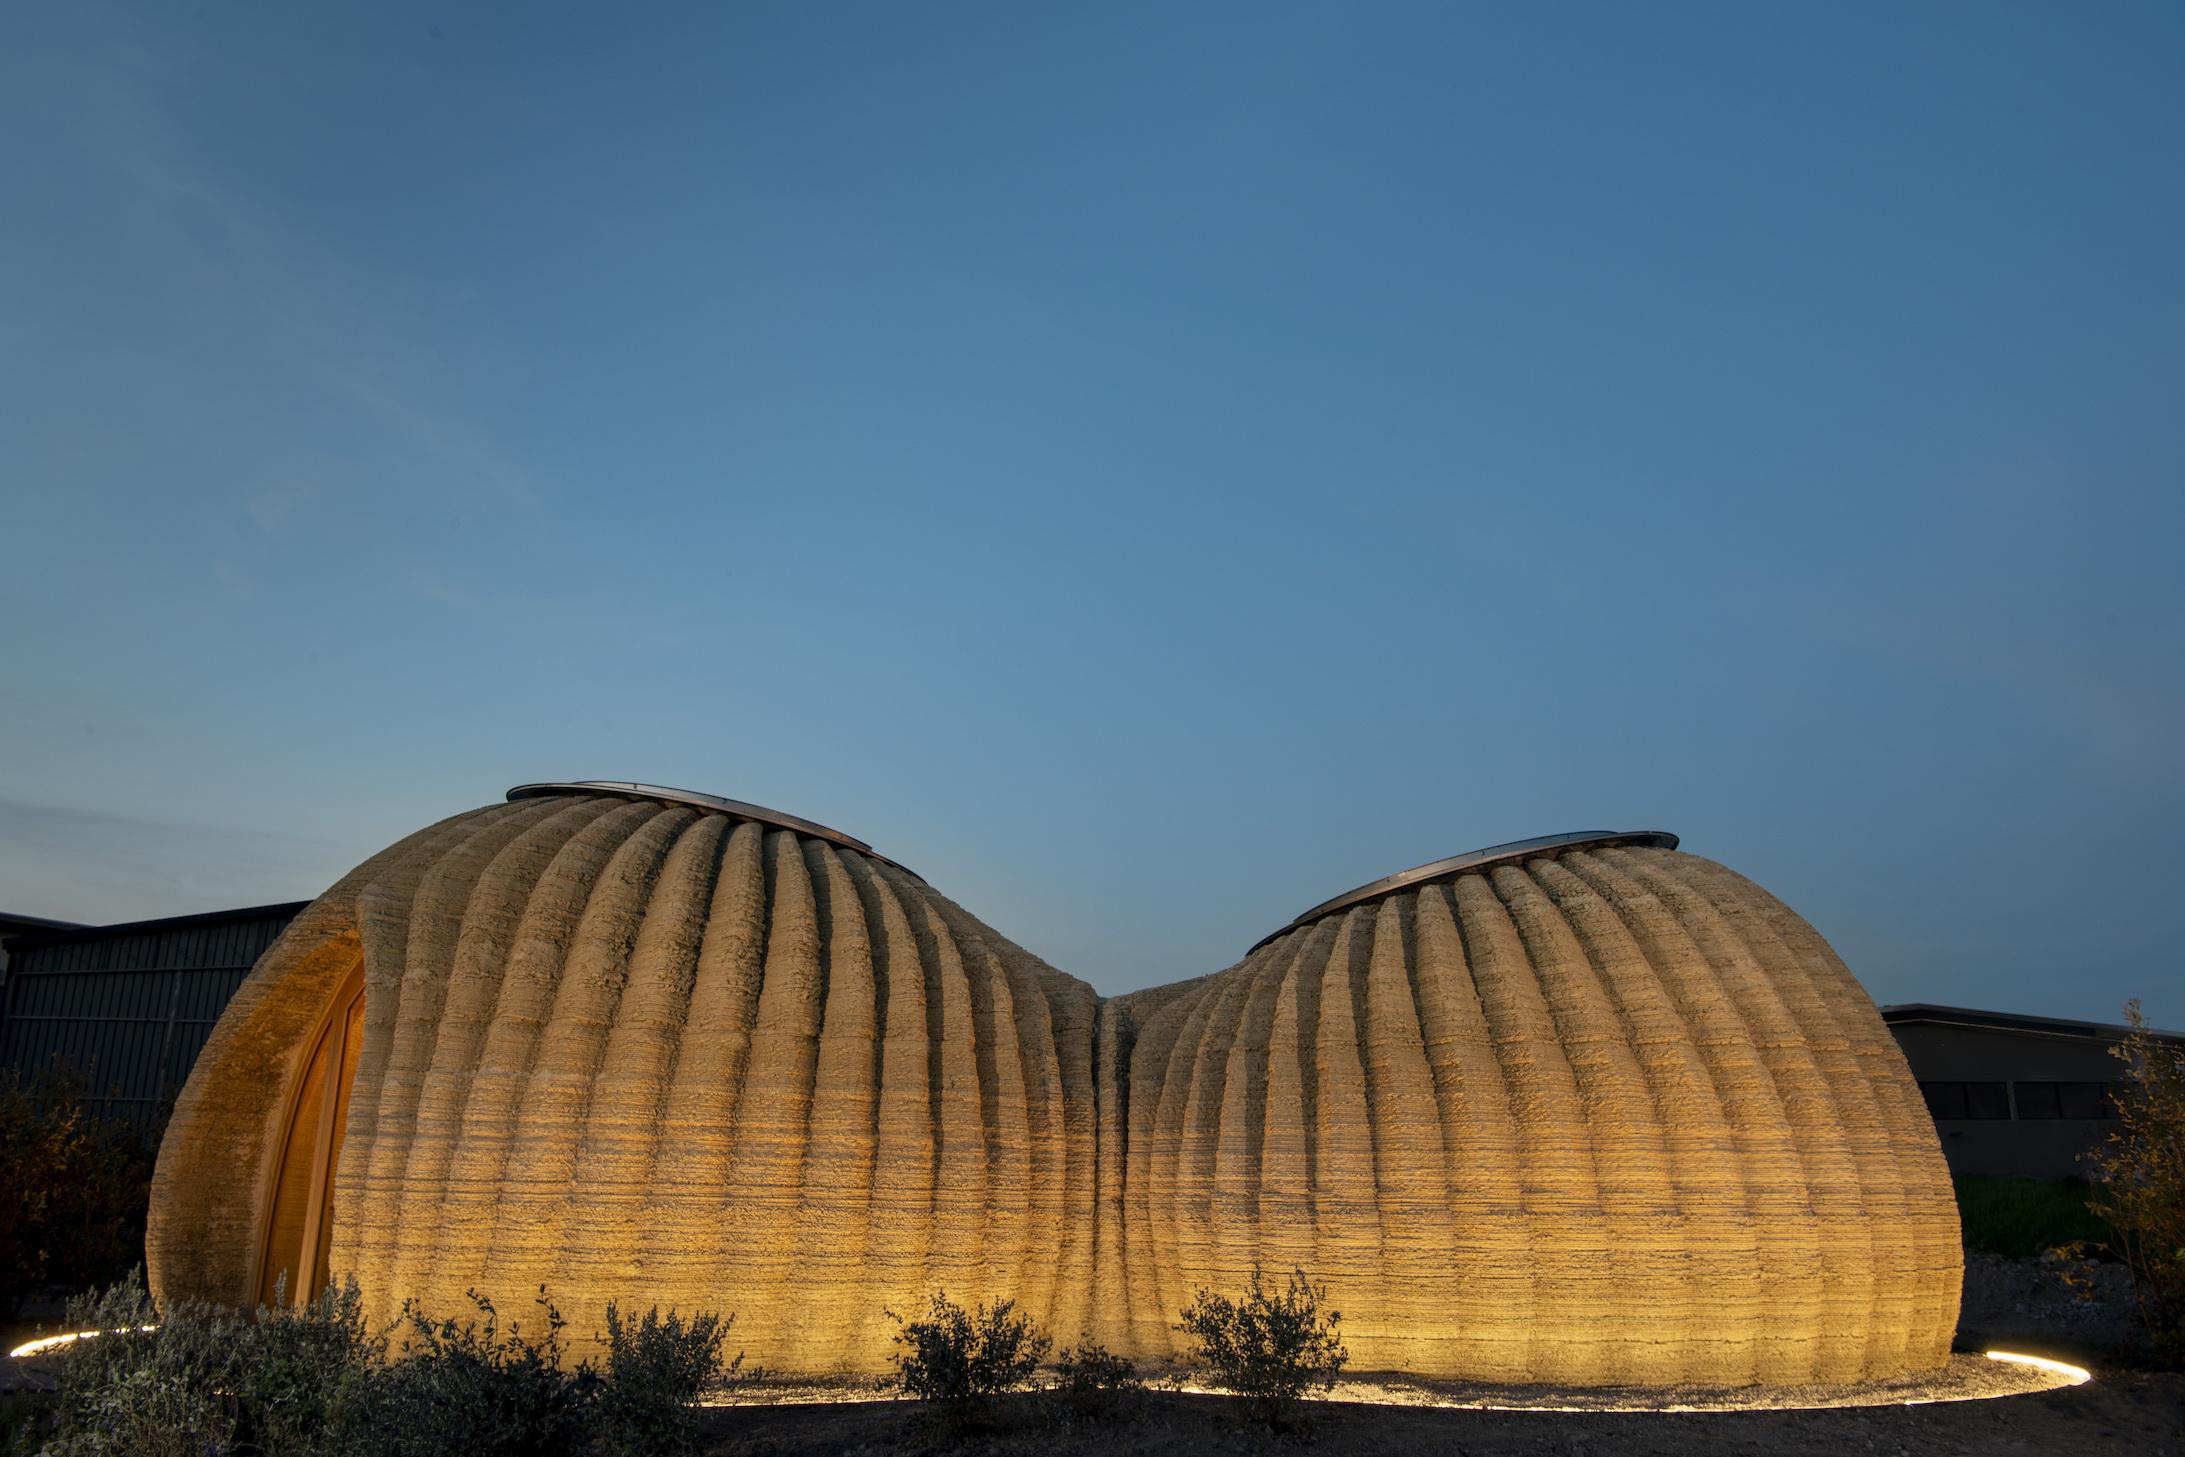 Mario Cucinella Architects, TECLA, Ravenna, 2021, External Dawn View, Photo by Iago Corazza